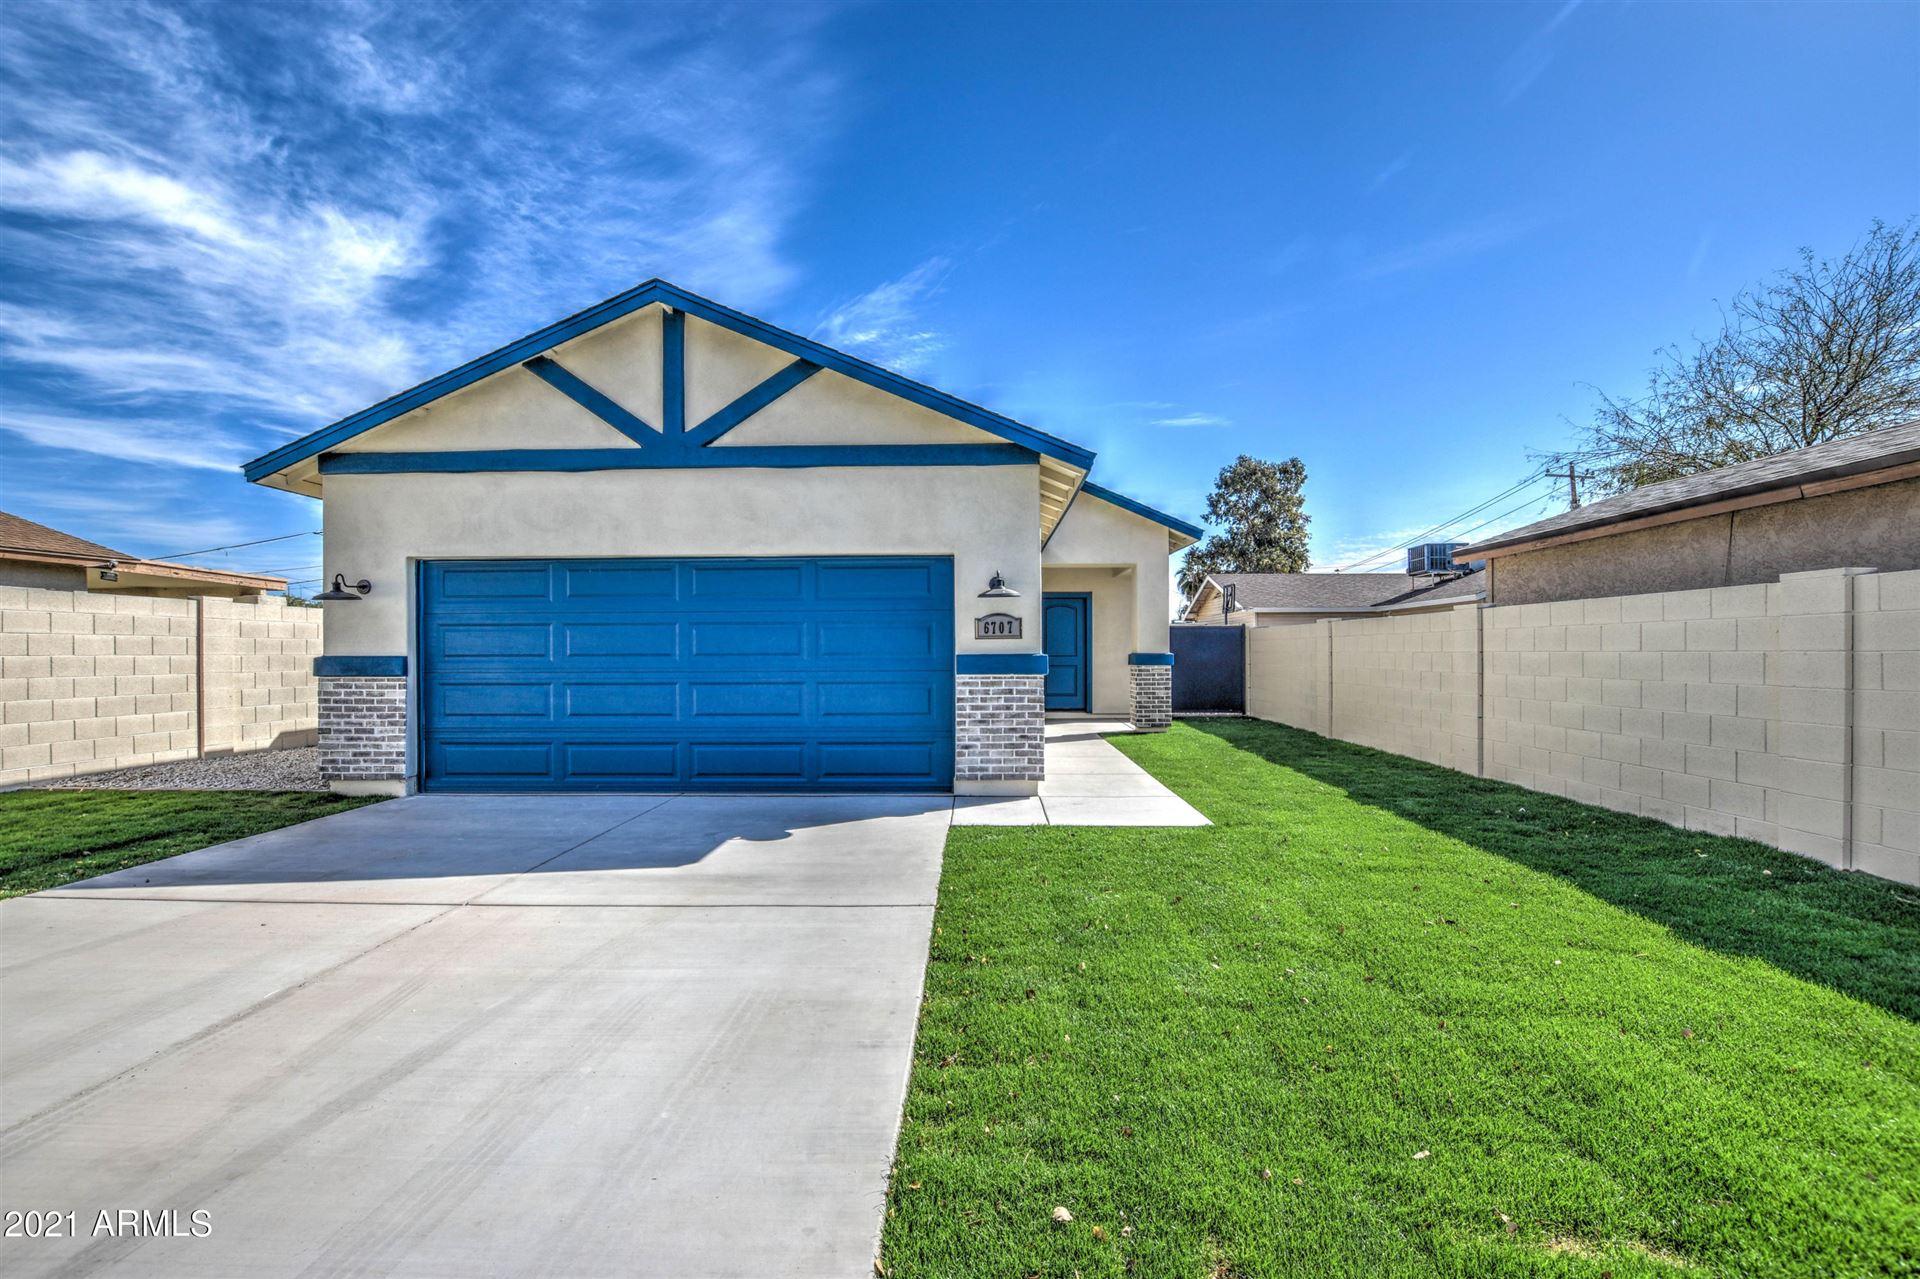 Photo of 6707 N 61ST Avenue, Glendale, AZ 85301 (MLS # 6188516)